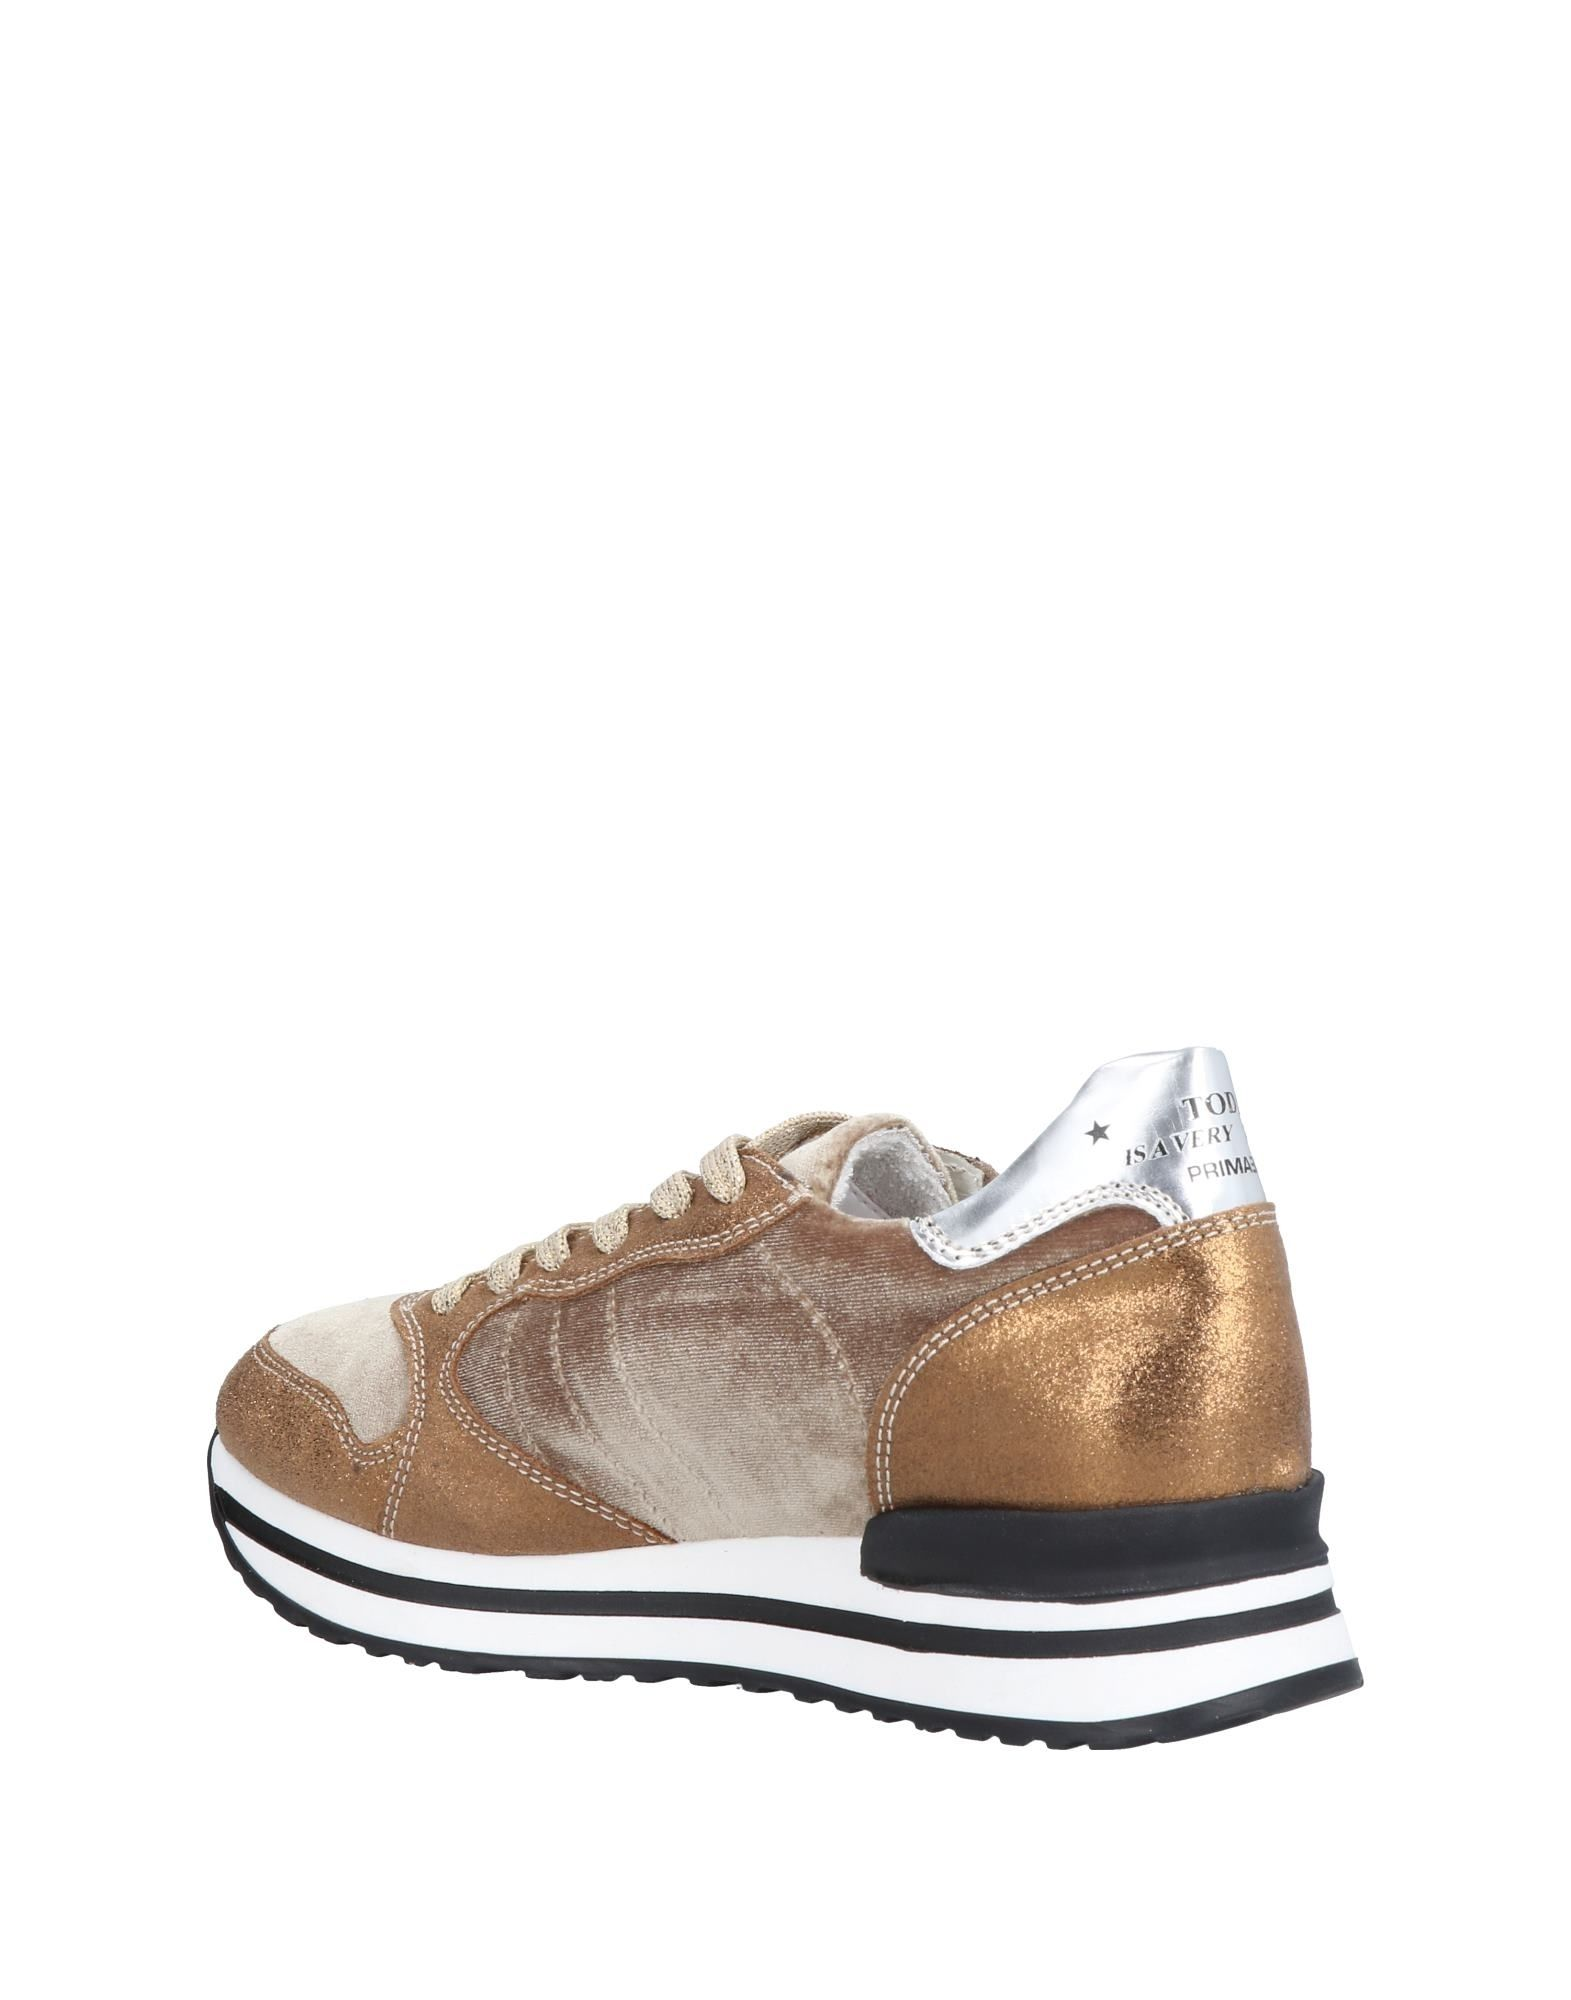 Primabase Sneakers Damen Damen Sneakers  11474821LW Heiße Schuhe 9ad706